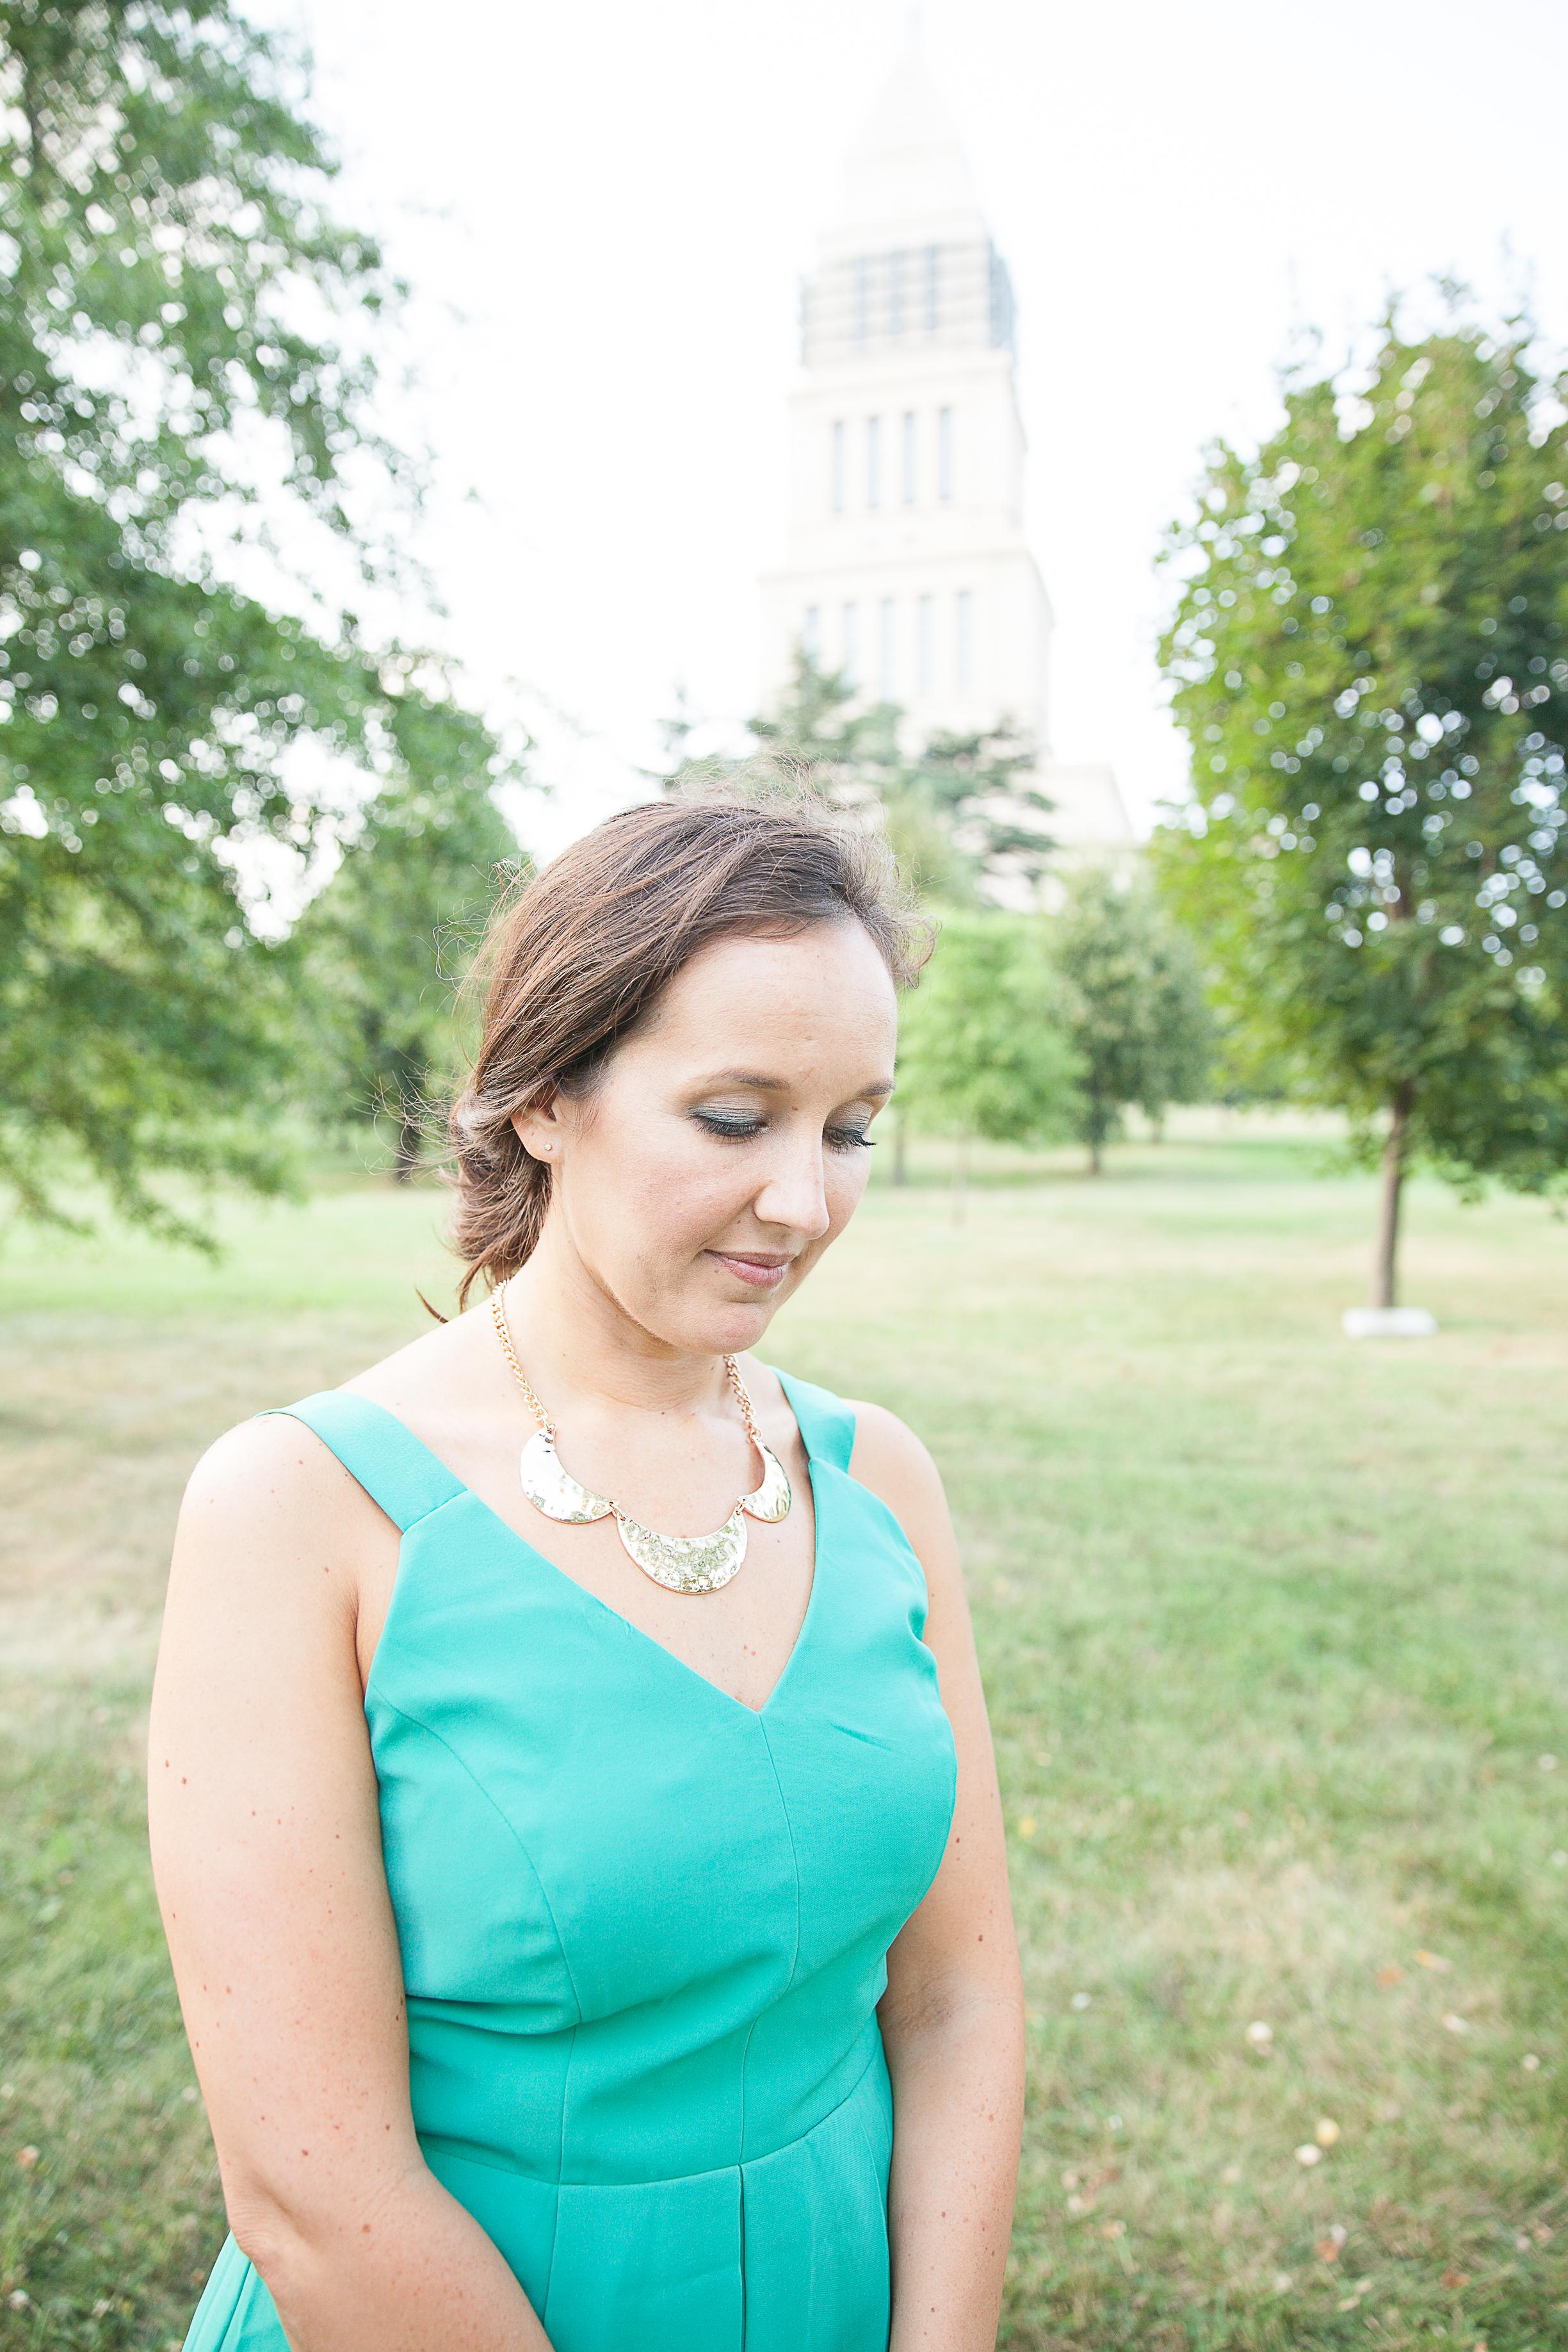 Marissa-Timon-Engagement-Kim-Pham-Clark-Photography-14.jpg